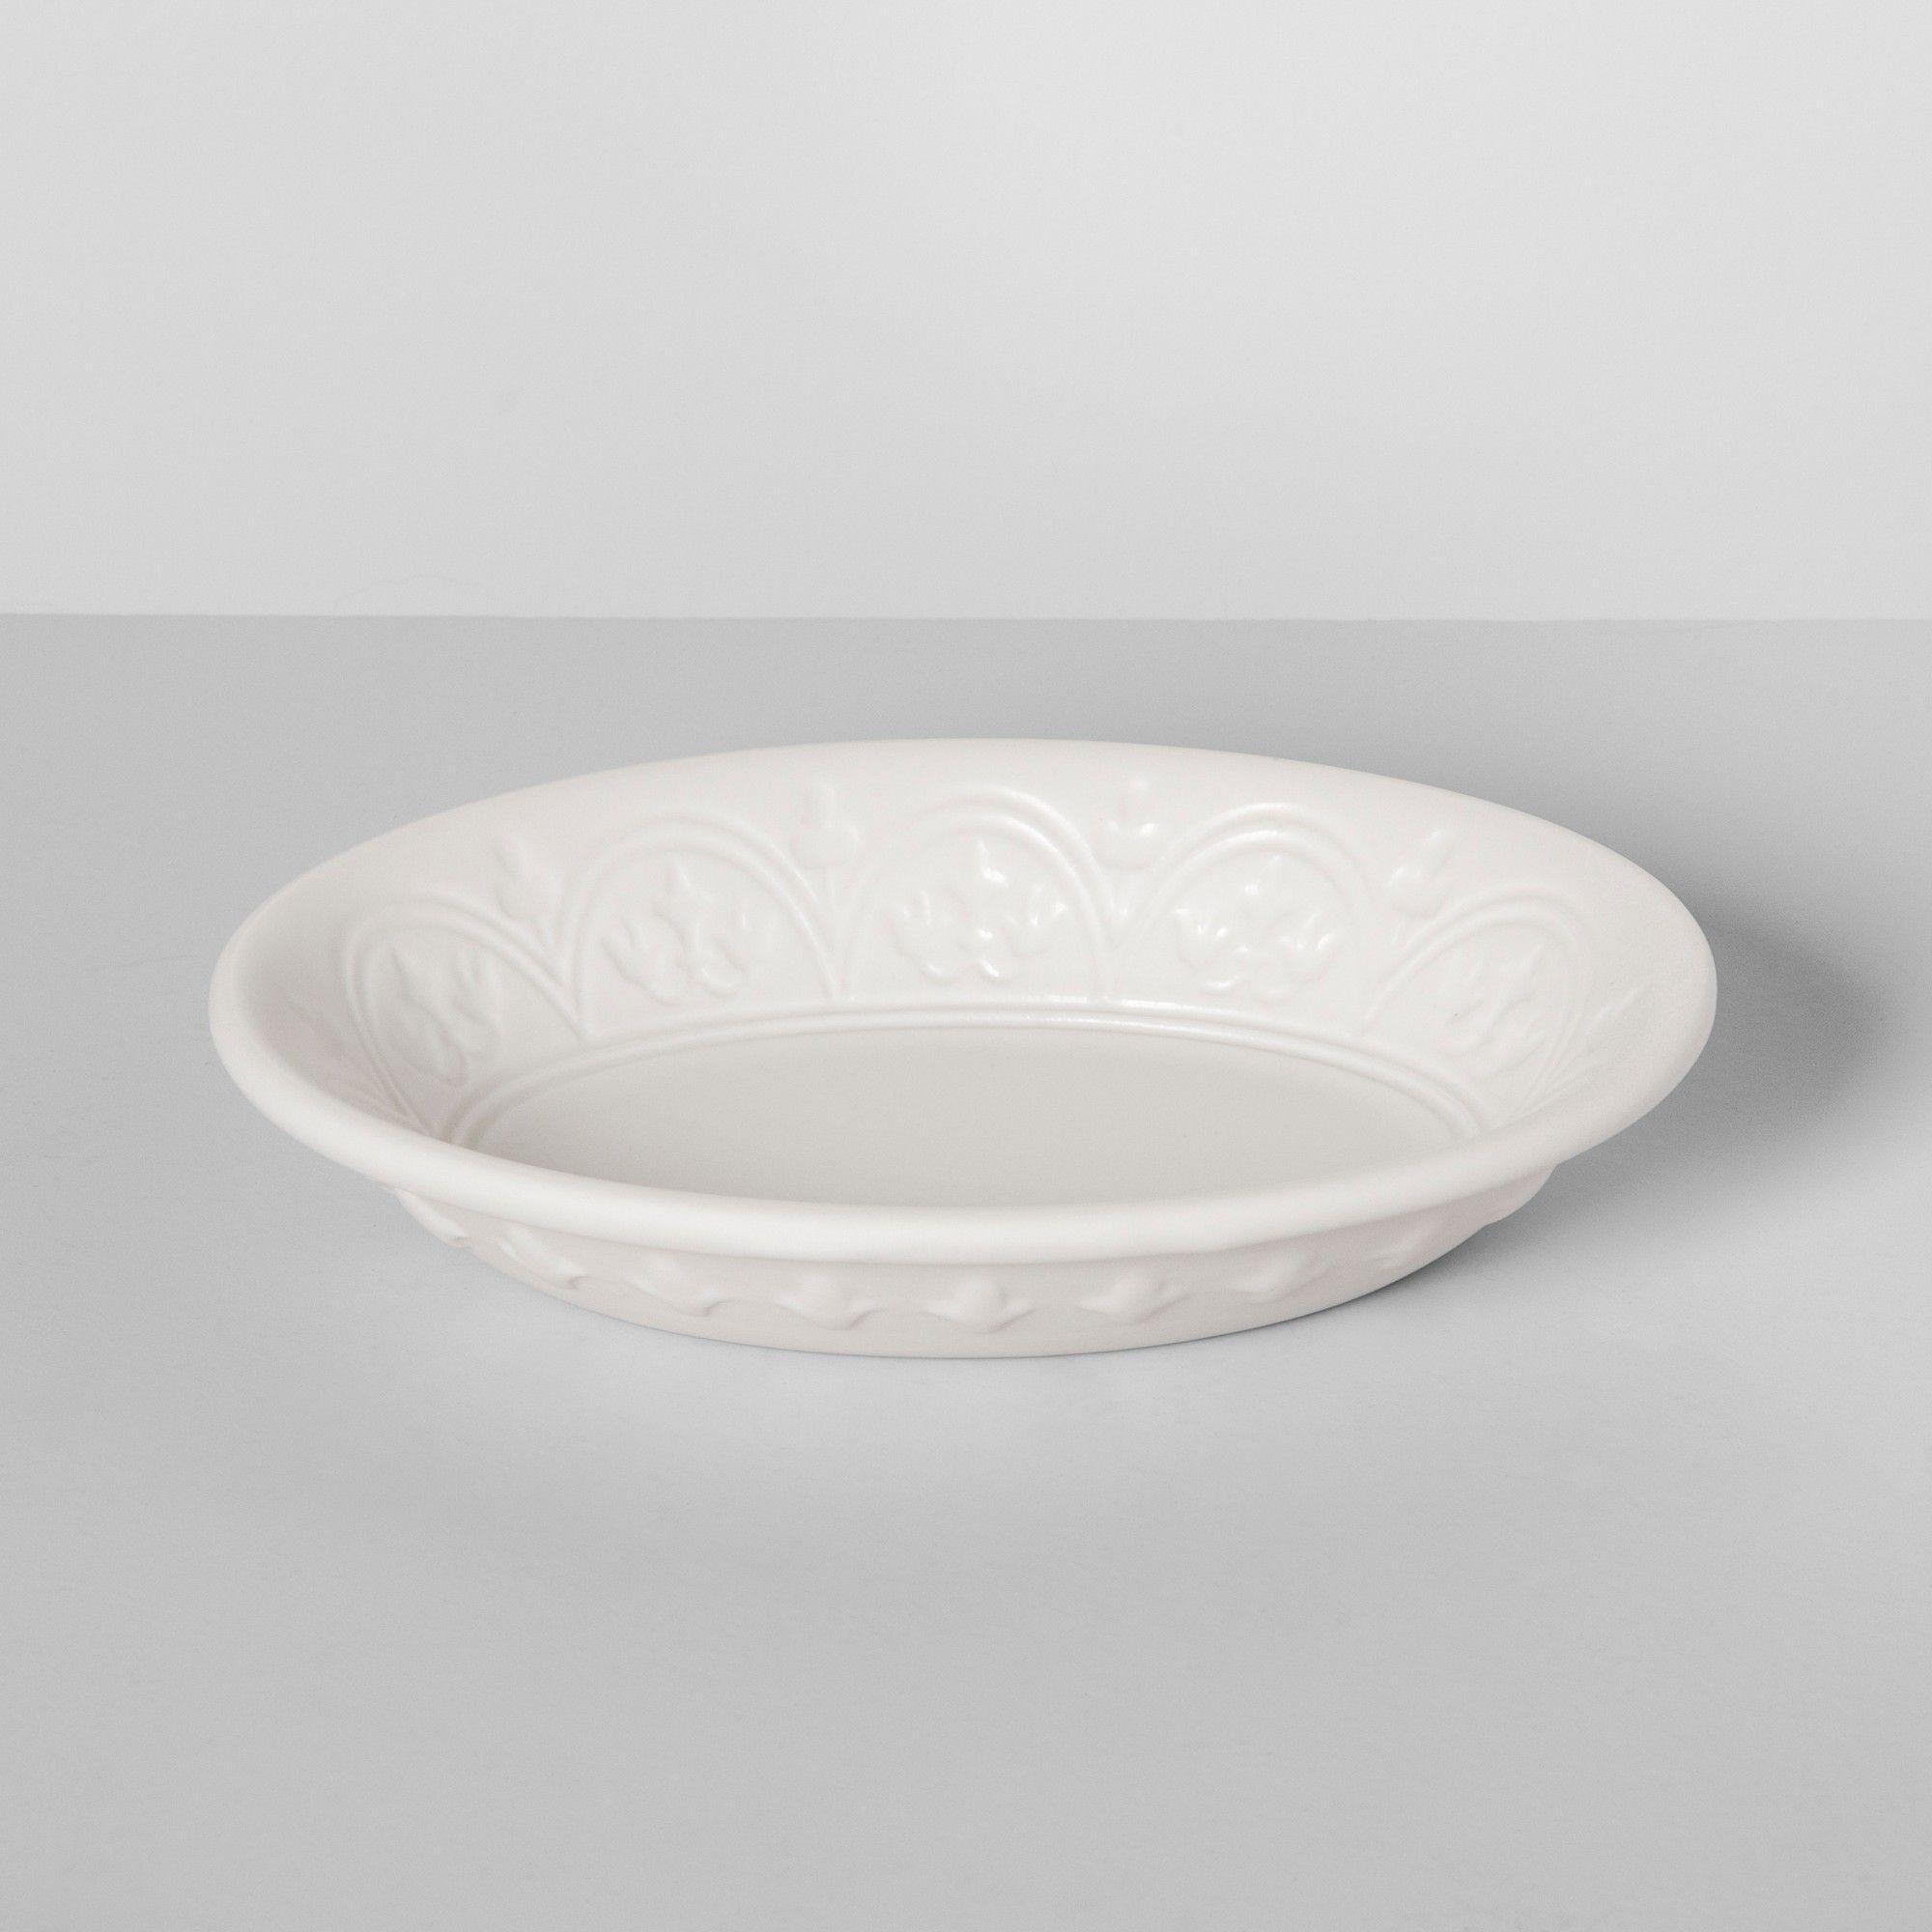 Mallorca Porcelain Soap Dish White Opalhouse Adult Unisex Porcelain Soap White Porcelain